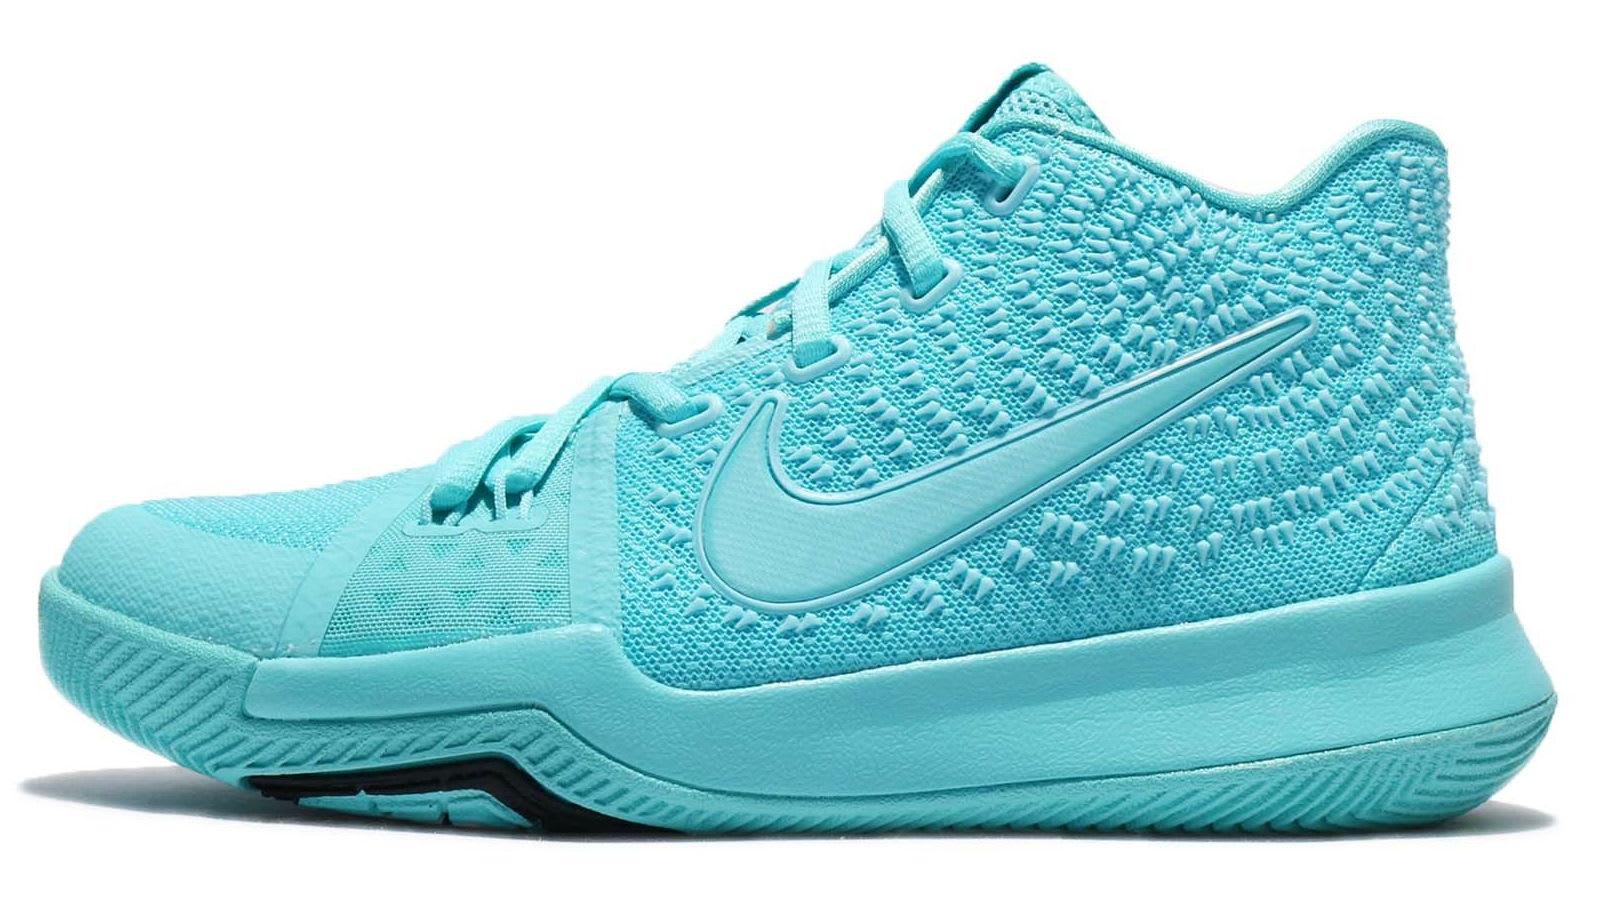 Nike Kyrie 3 GS Aqua Release Date Profile 859466-401